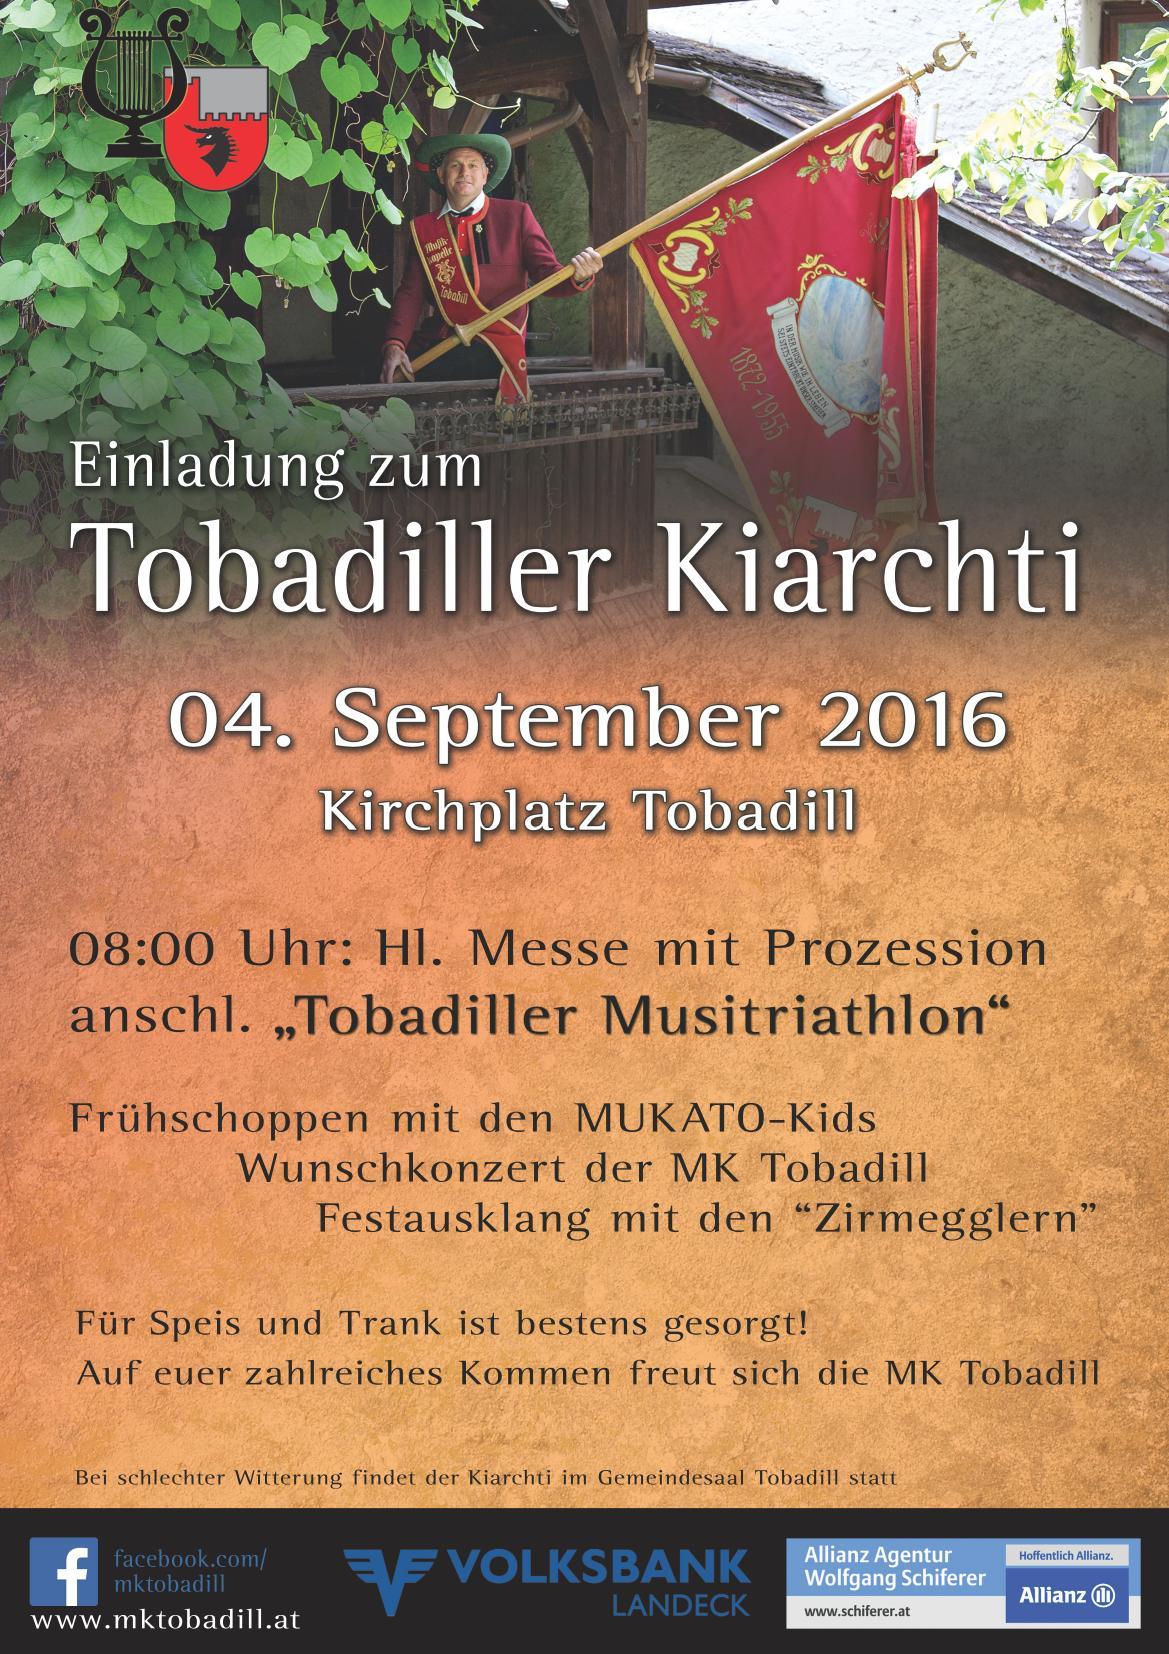 A2_Web_Tobadiller Kiarchti